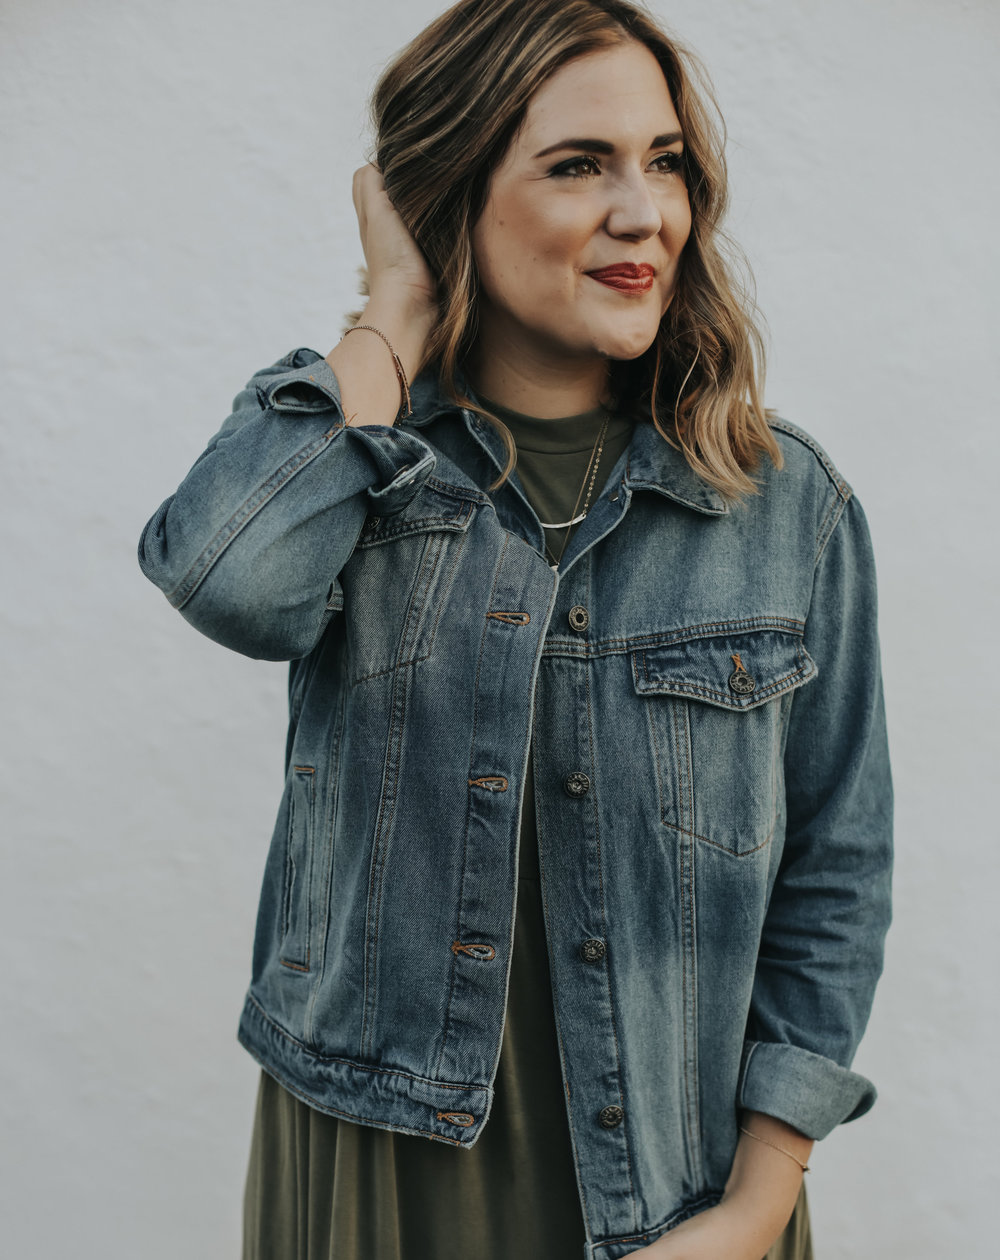 Join Emma Steadman's team and become a SeneGence LipSense Distributor